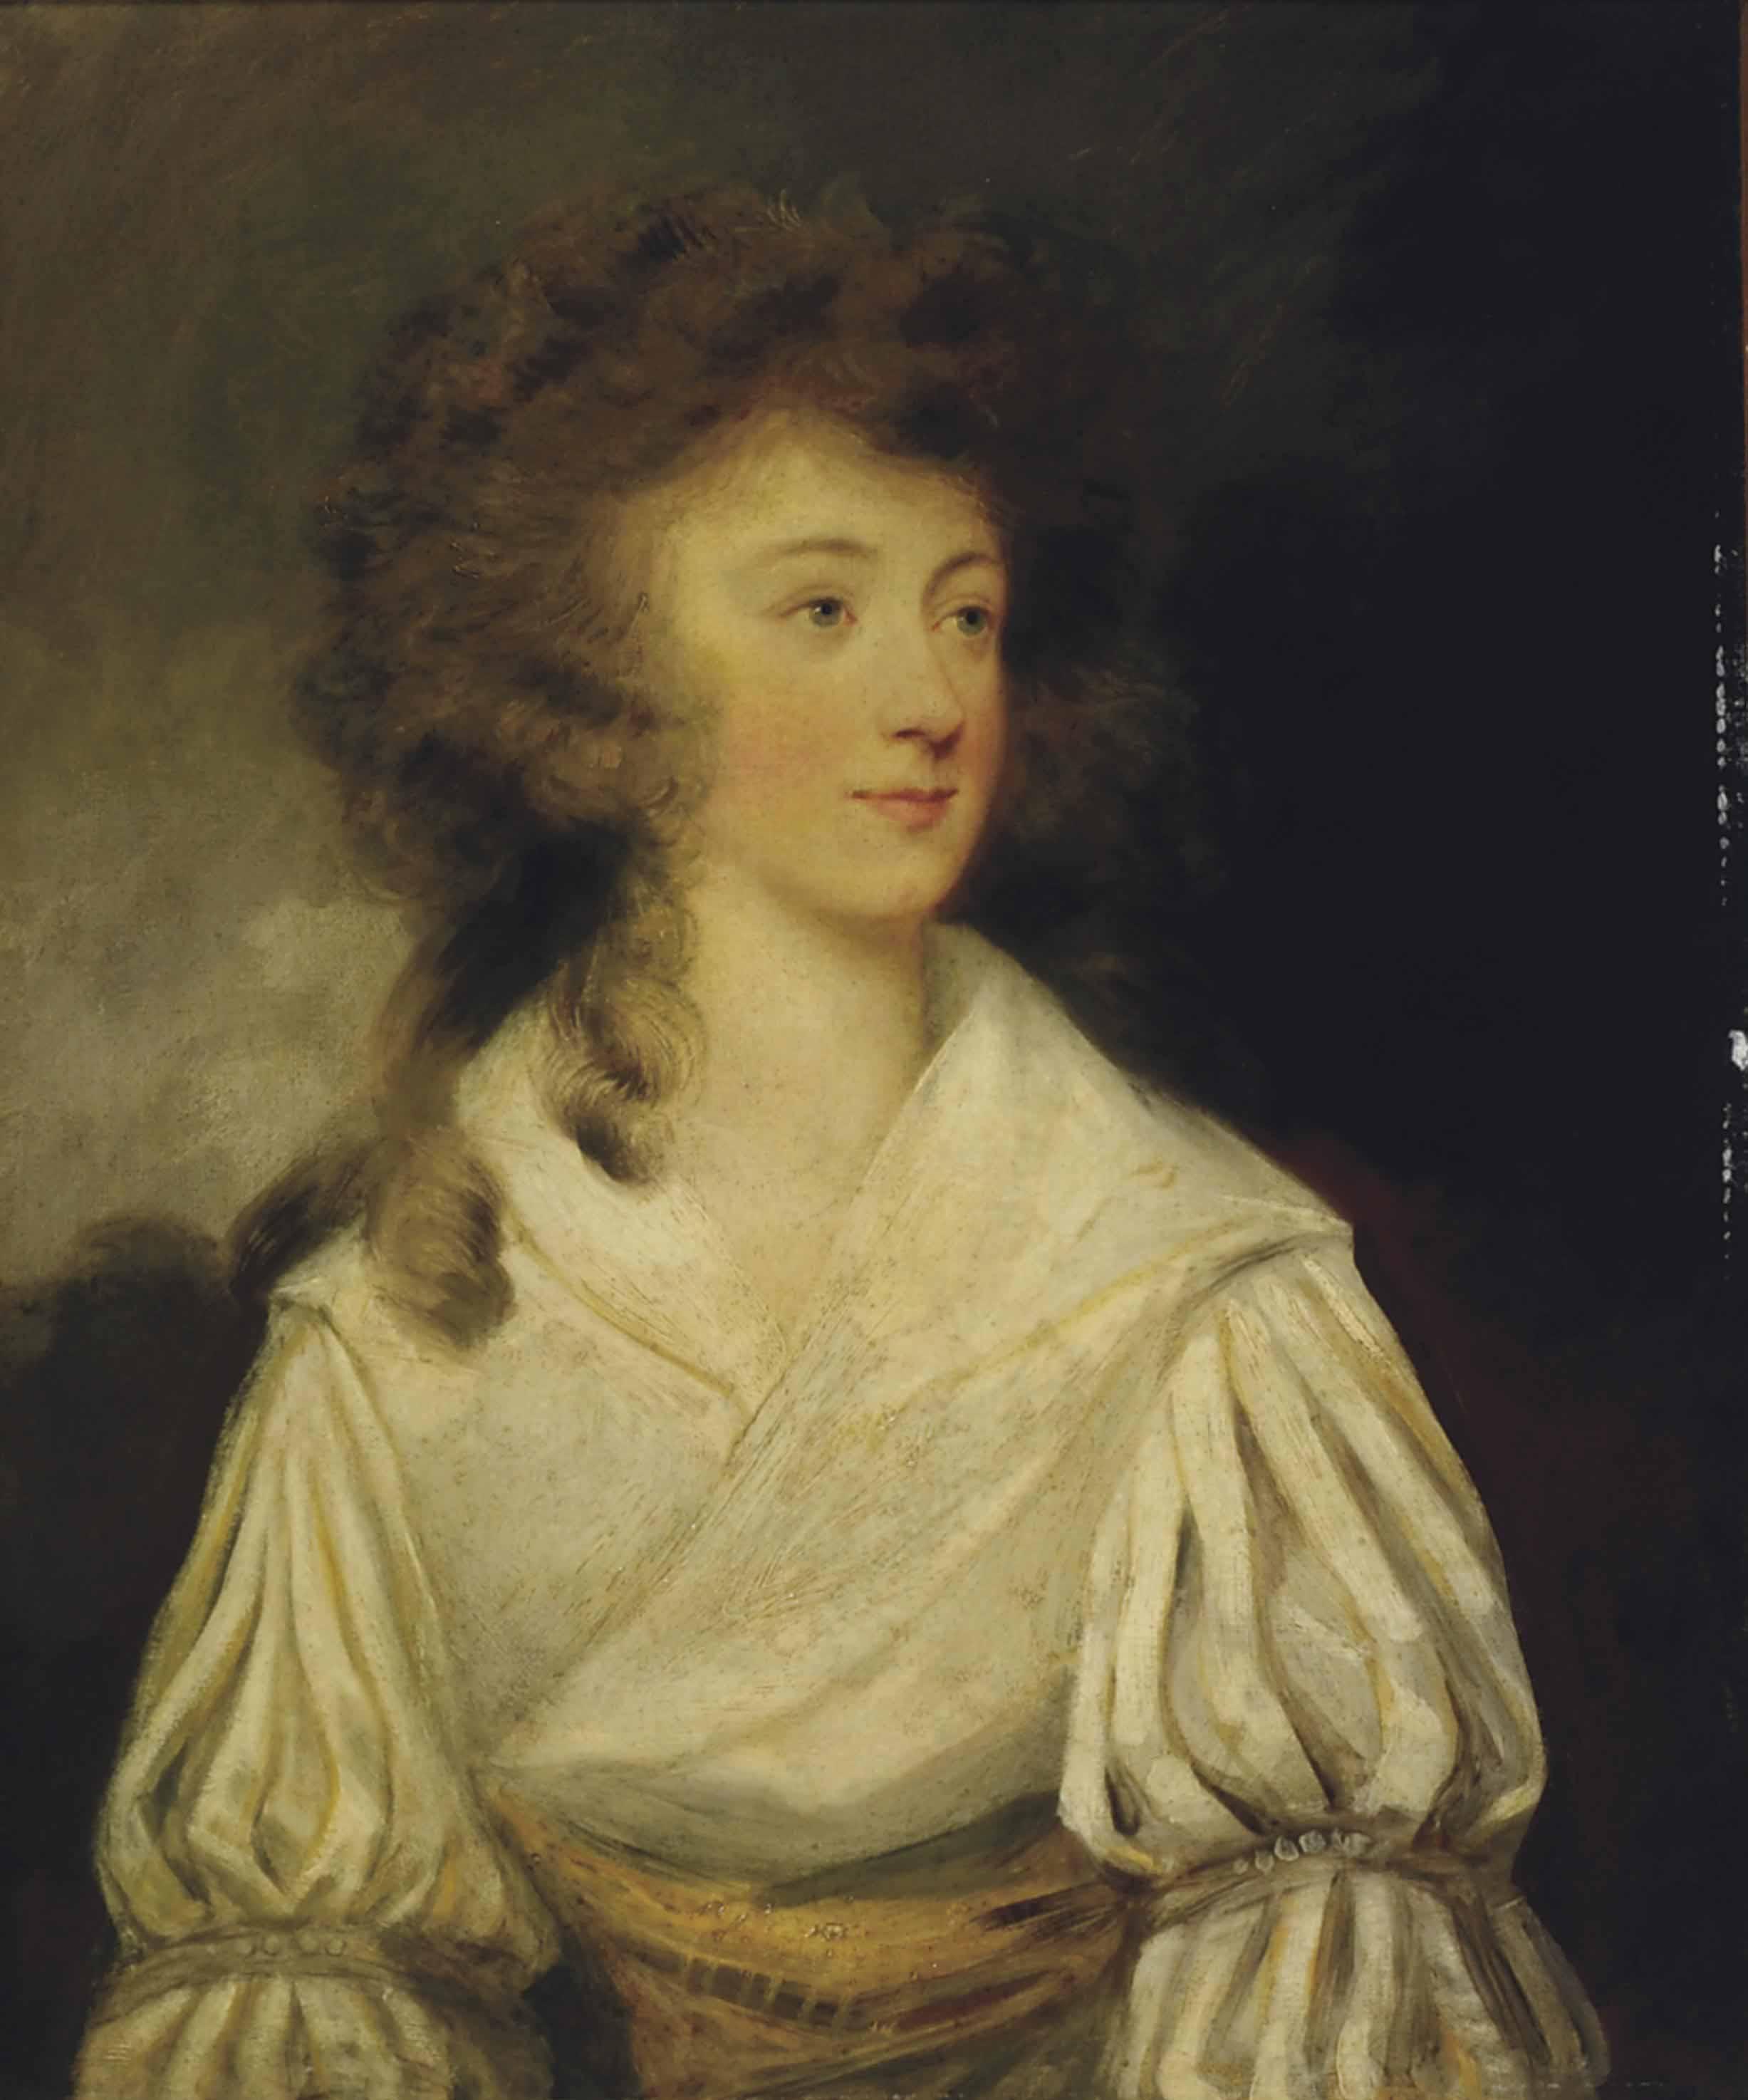 Portrait of Mrs Guyon, half-length, in a white dress